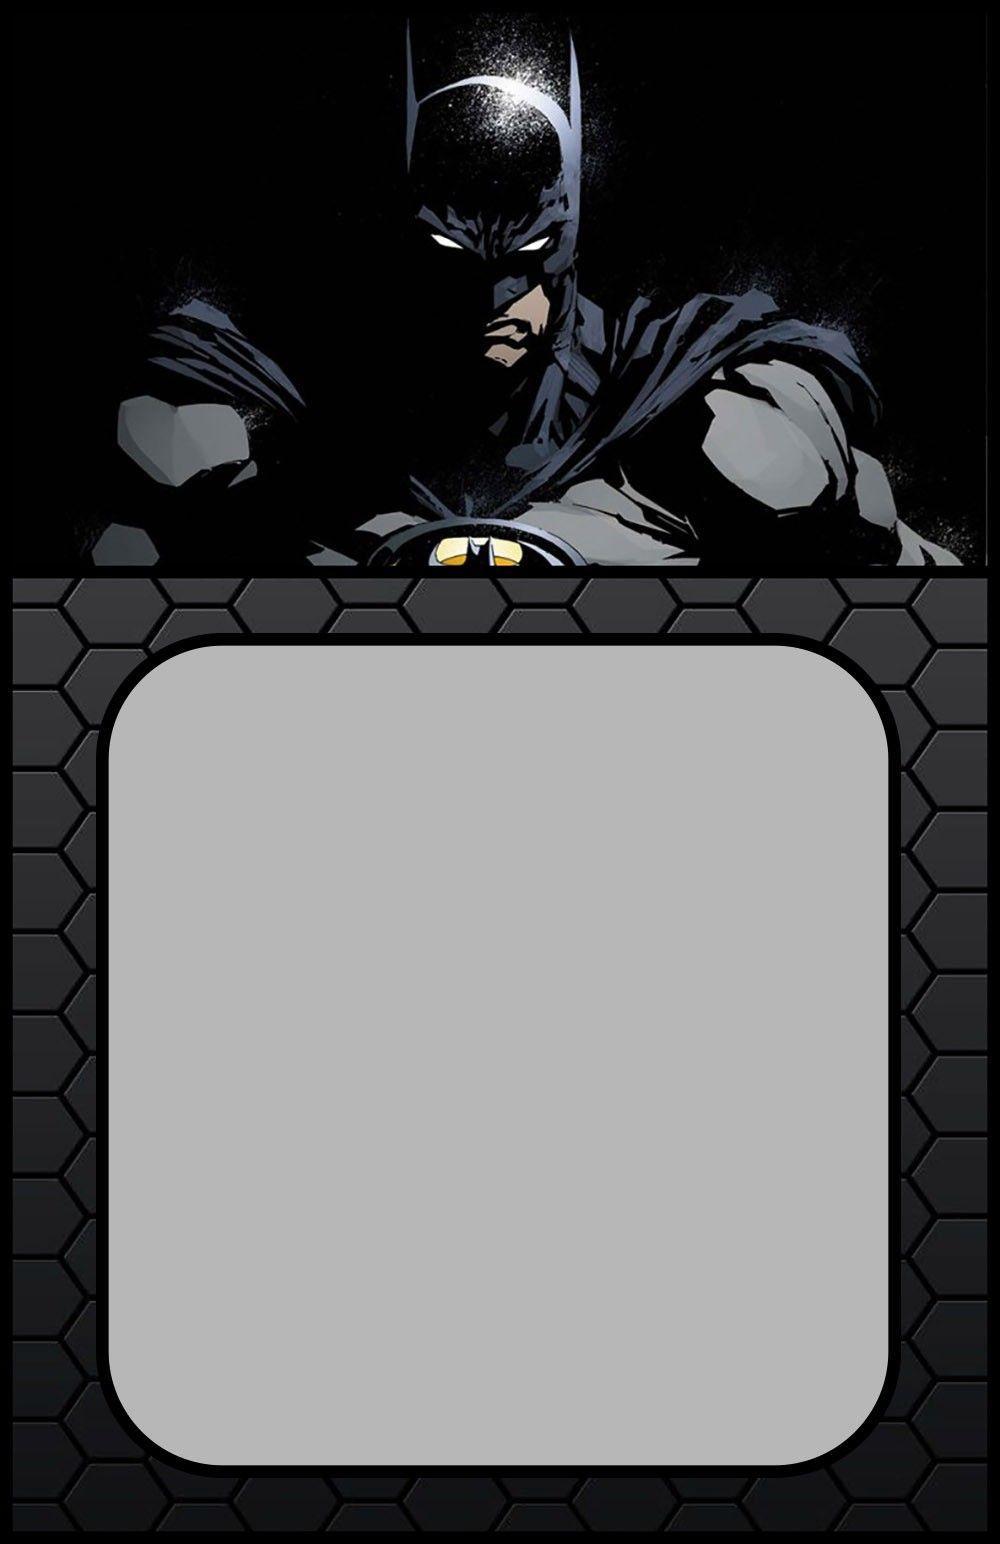 Batman Invitation Templates